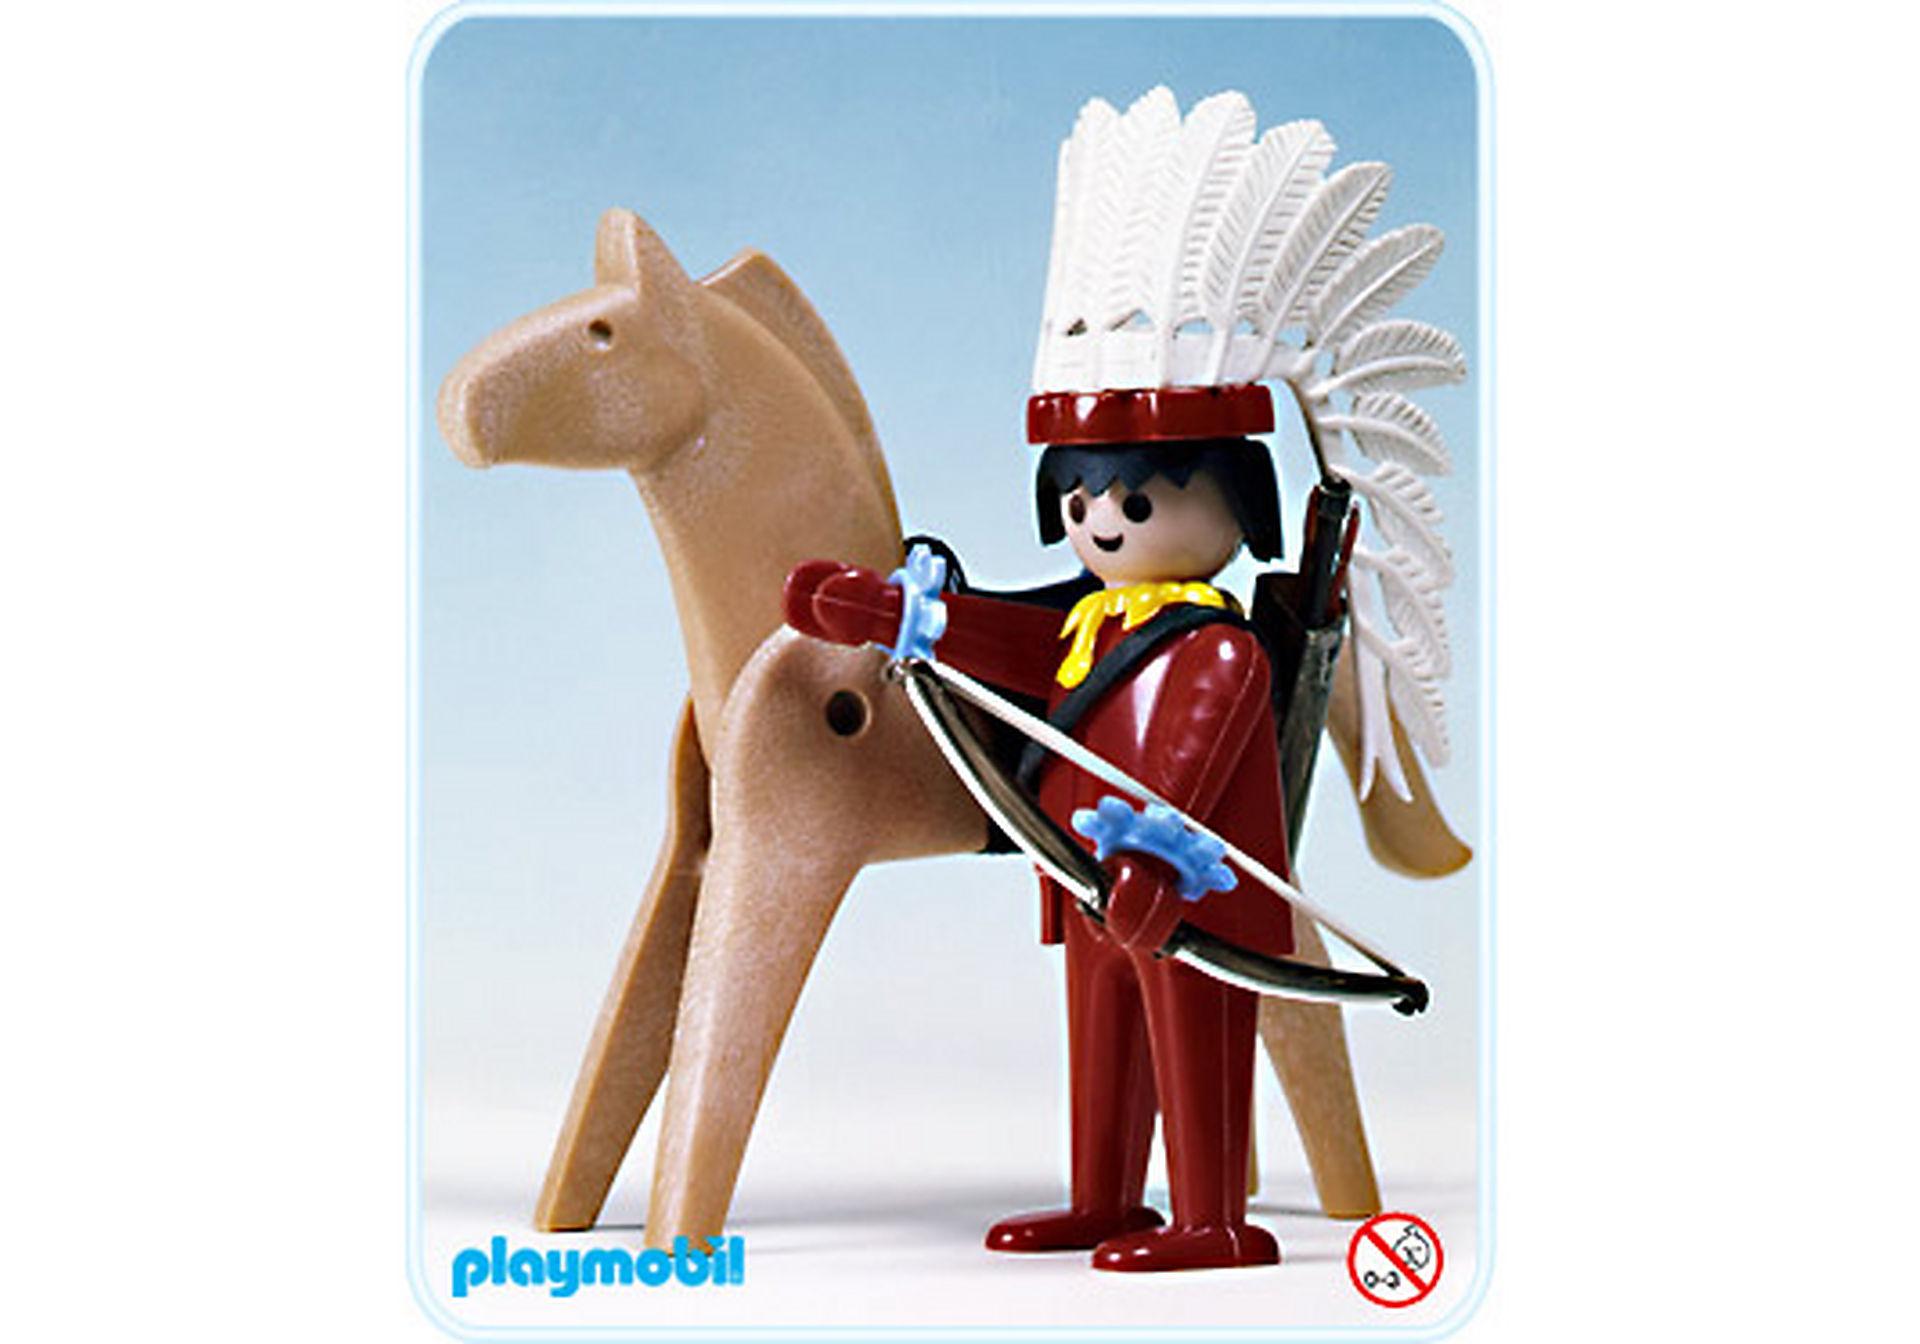 3351-A Indianer-Häuptling/Pferd zoom image1